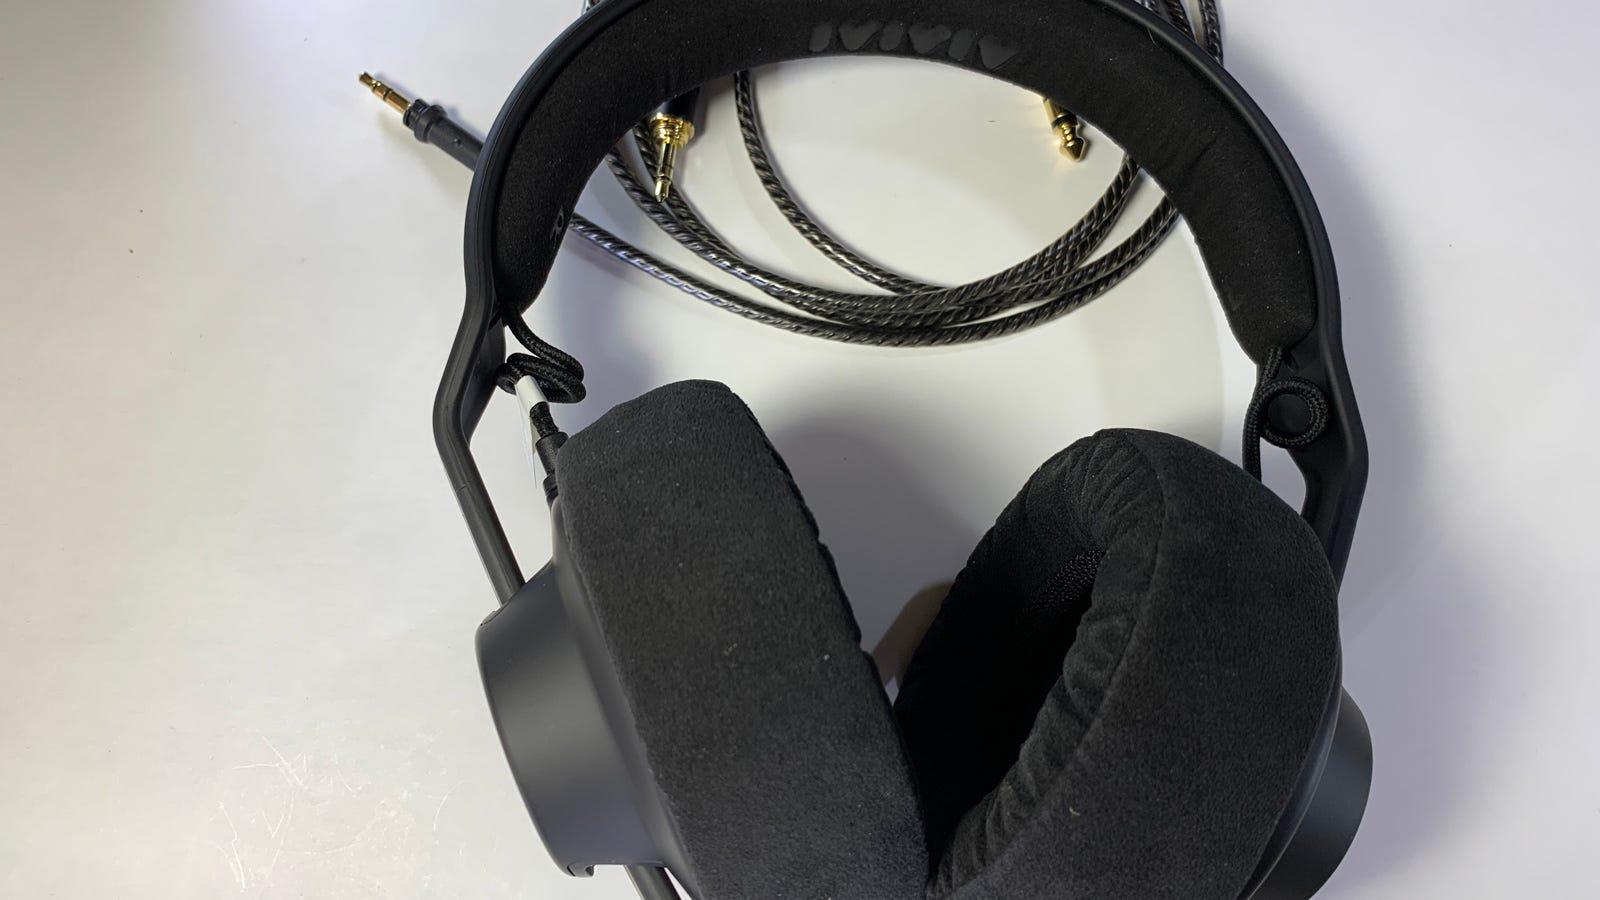 Image of assembled headphones